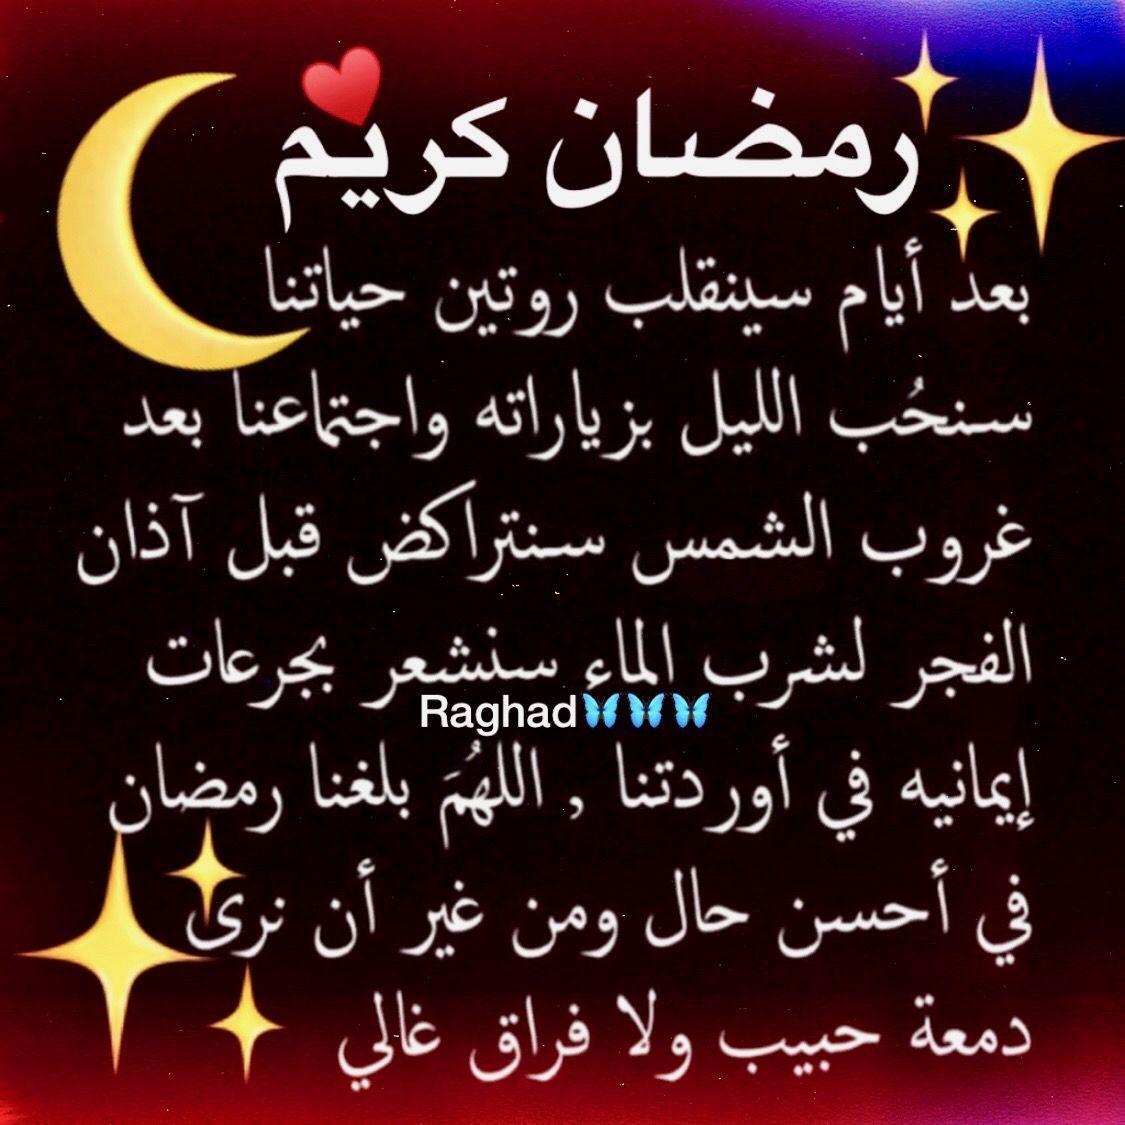 Desertrose اللهم ربنا استجابة وتسهيل ا وتوفيق ا وبركة لتلك الدعوات والأمنيات المستودعة بين عظيم لطفك وواسع رحمتك Ramadan Ramadan Kareem Desert Rose